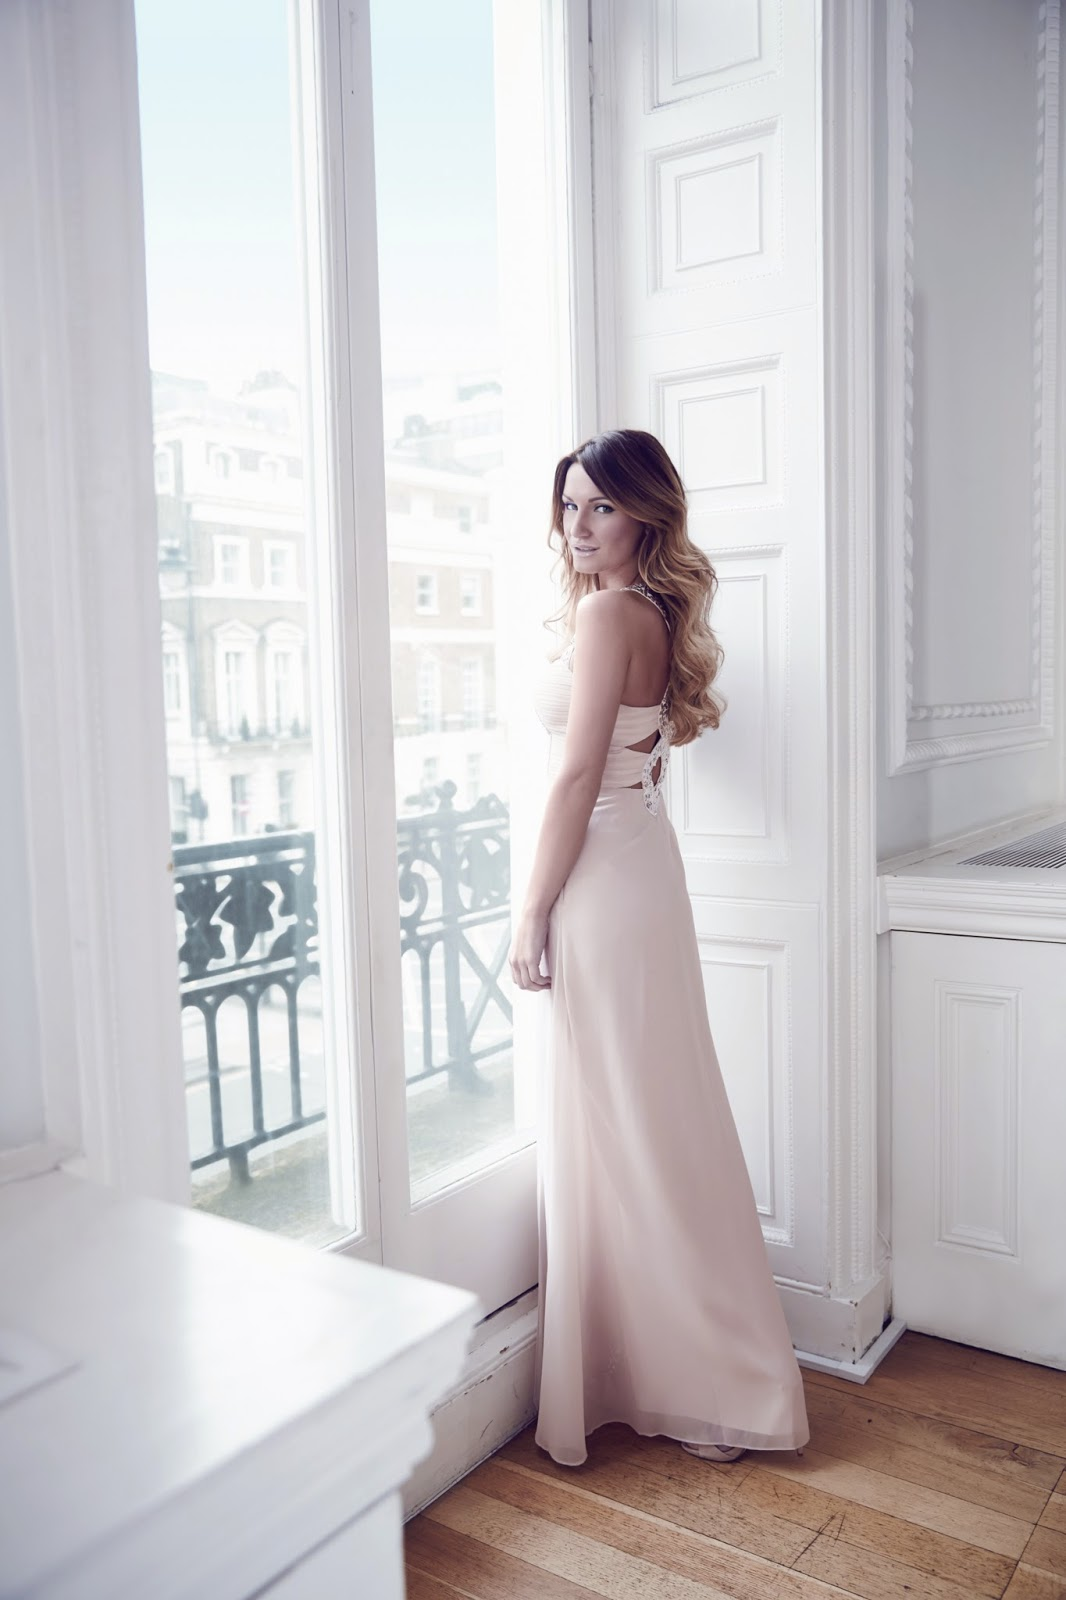 Sam Samantha Faiers debut perfume La Bella